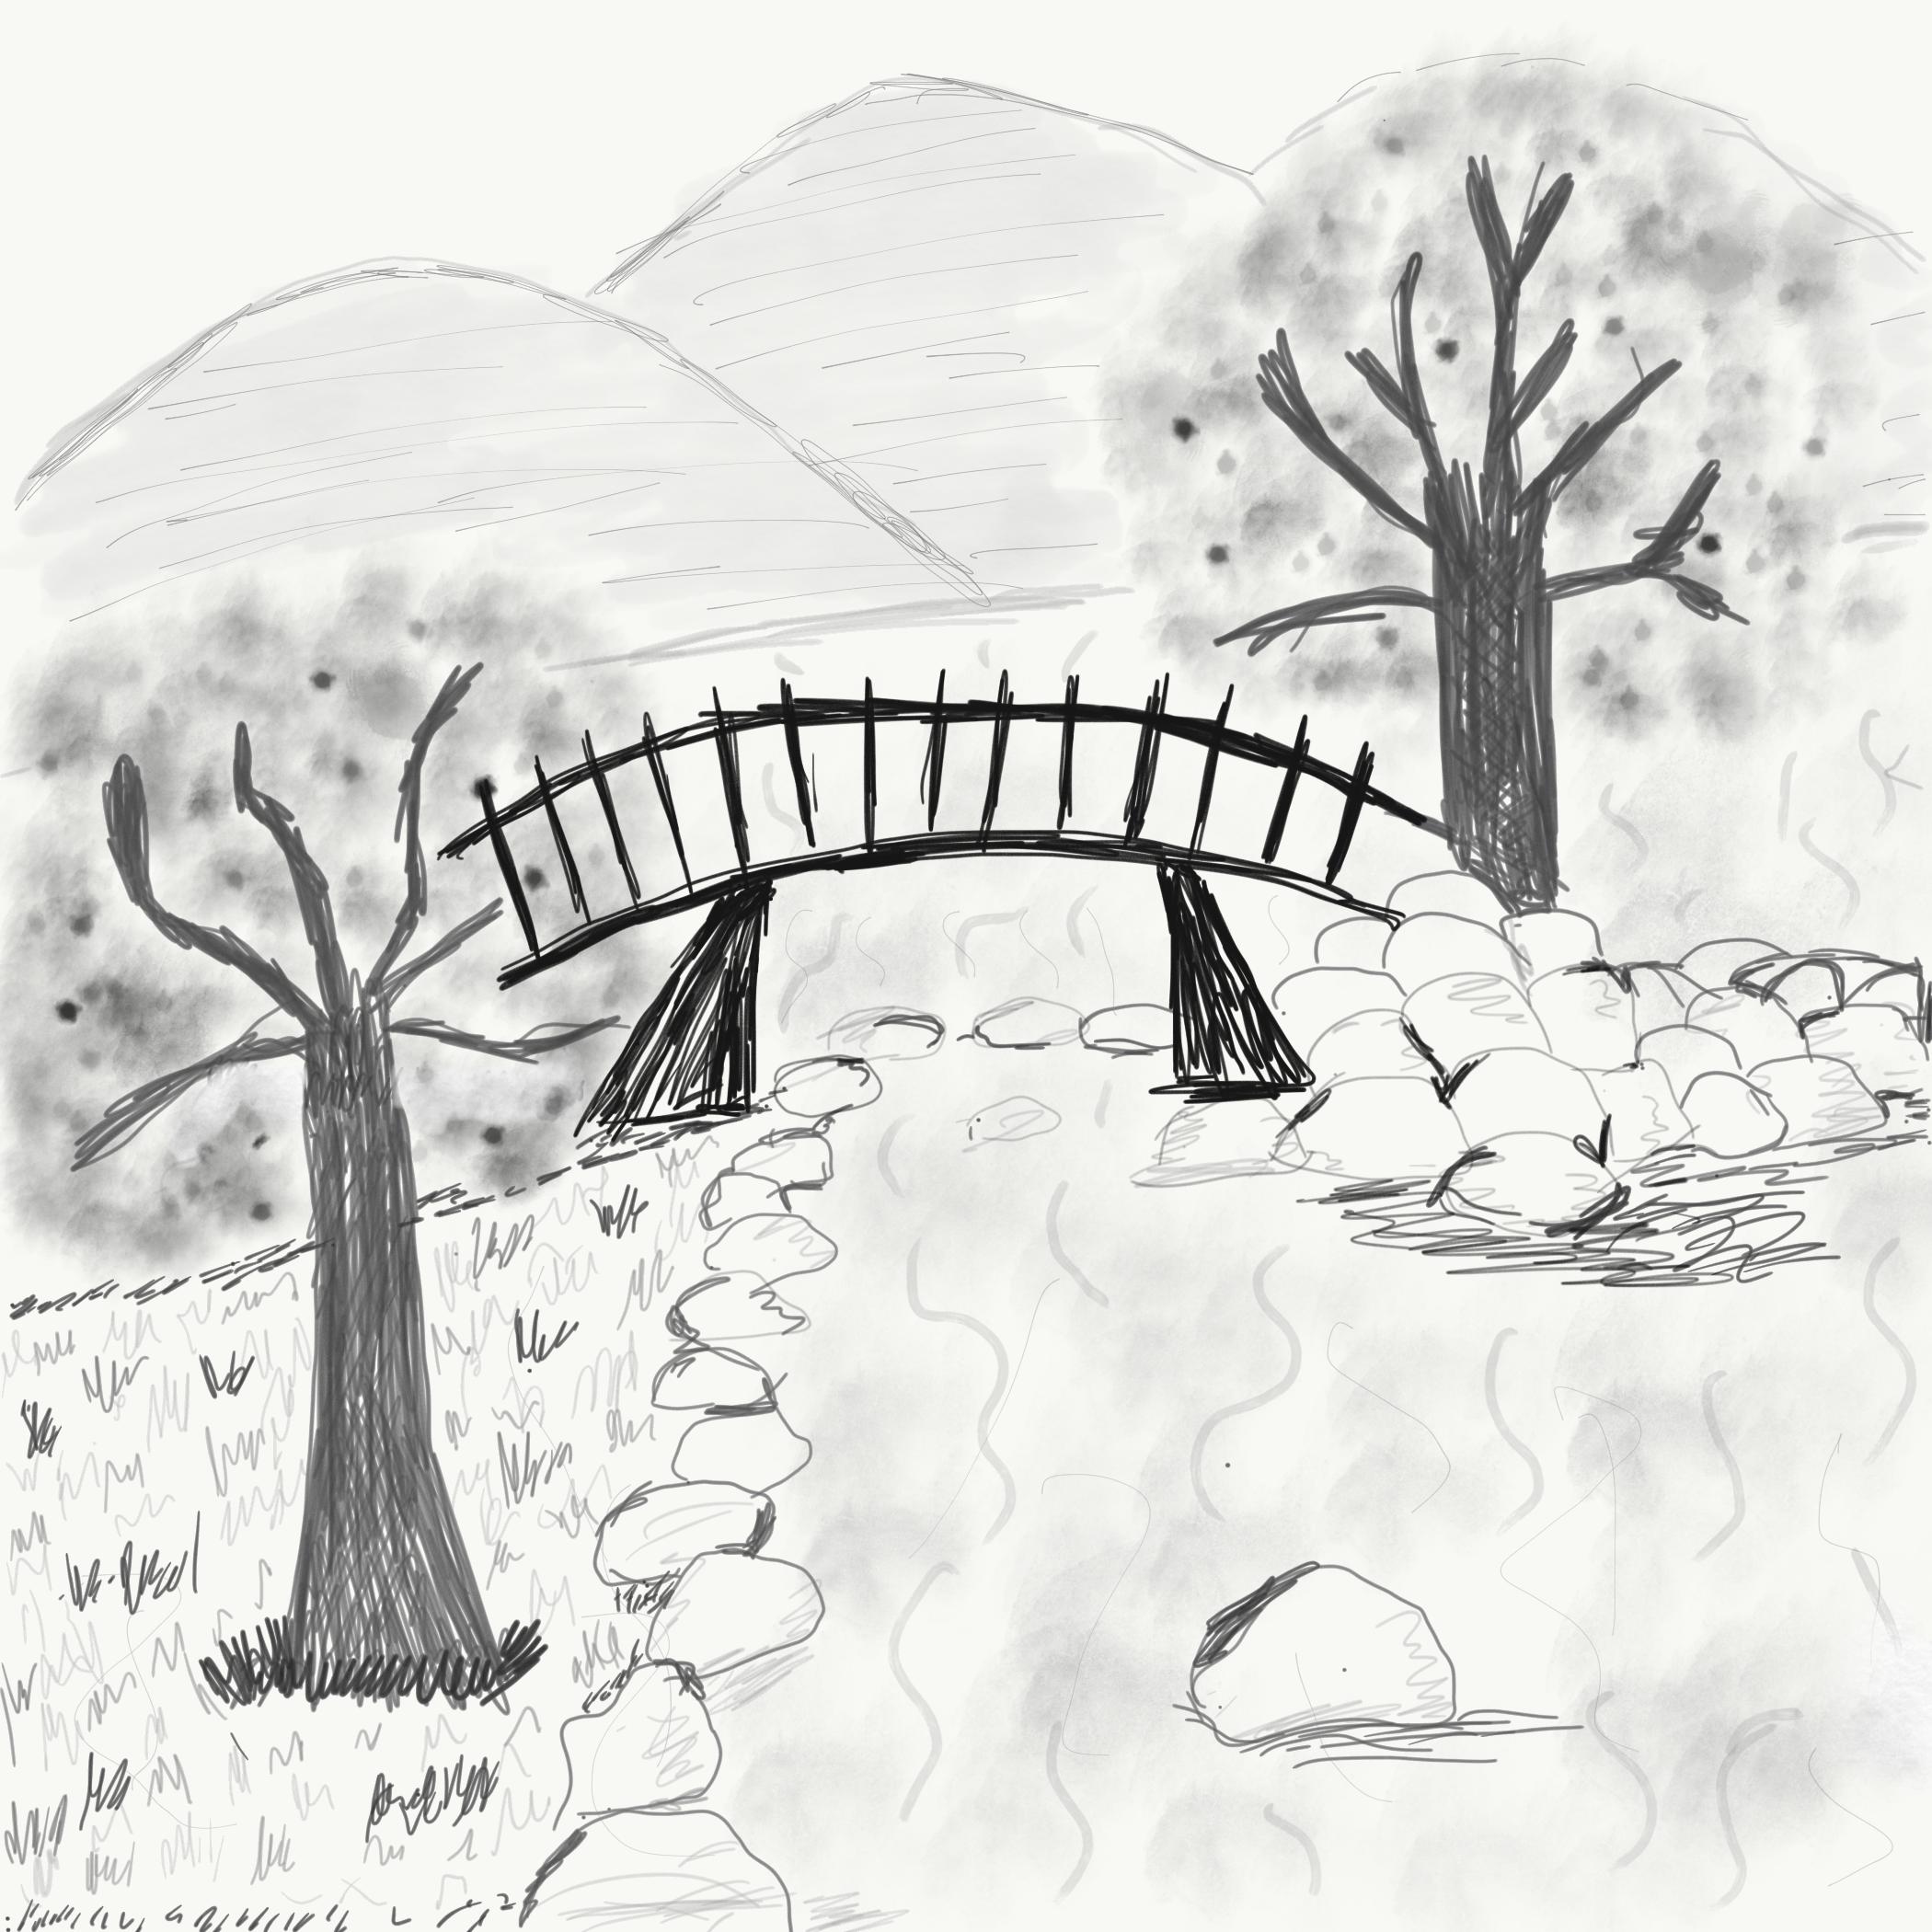 Sketch of trees and bridge